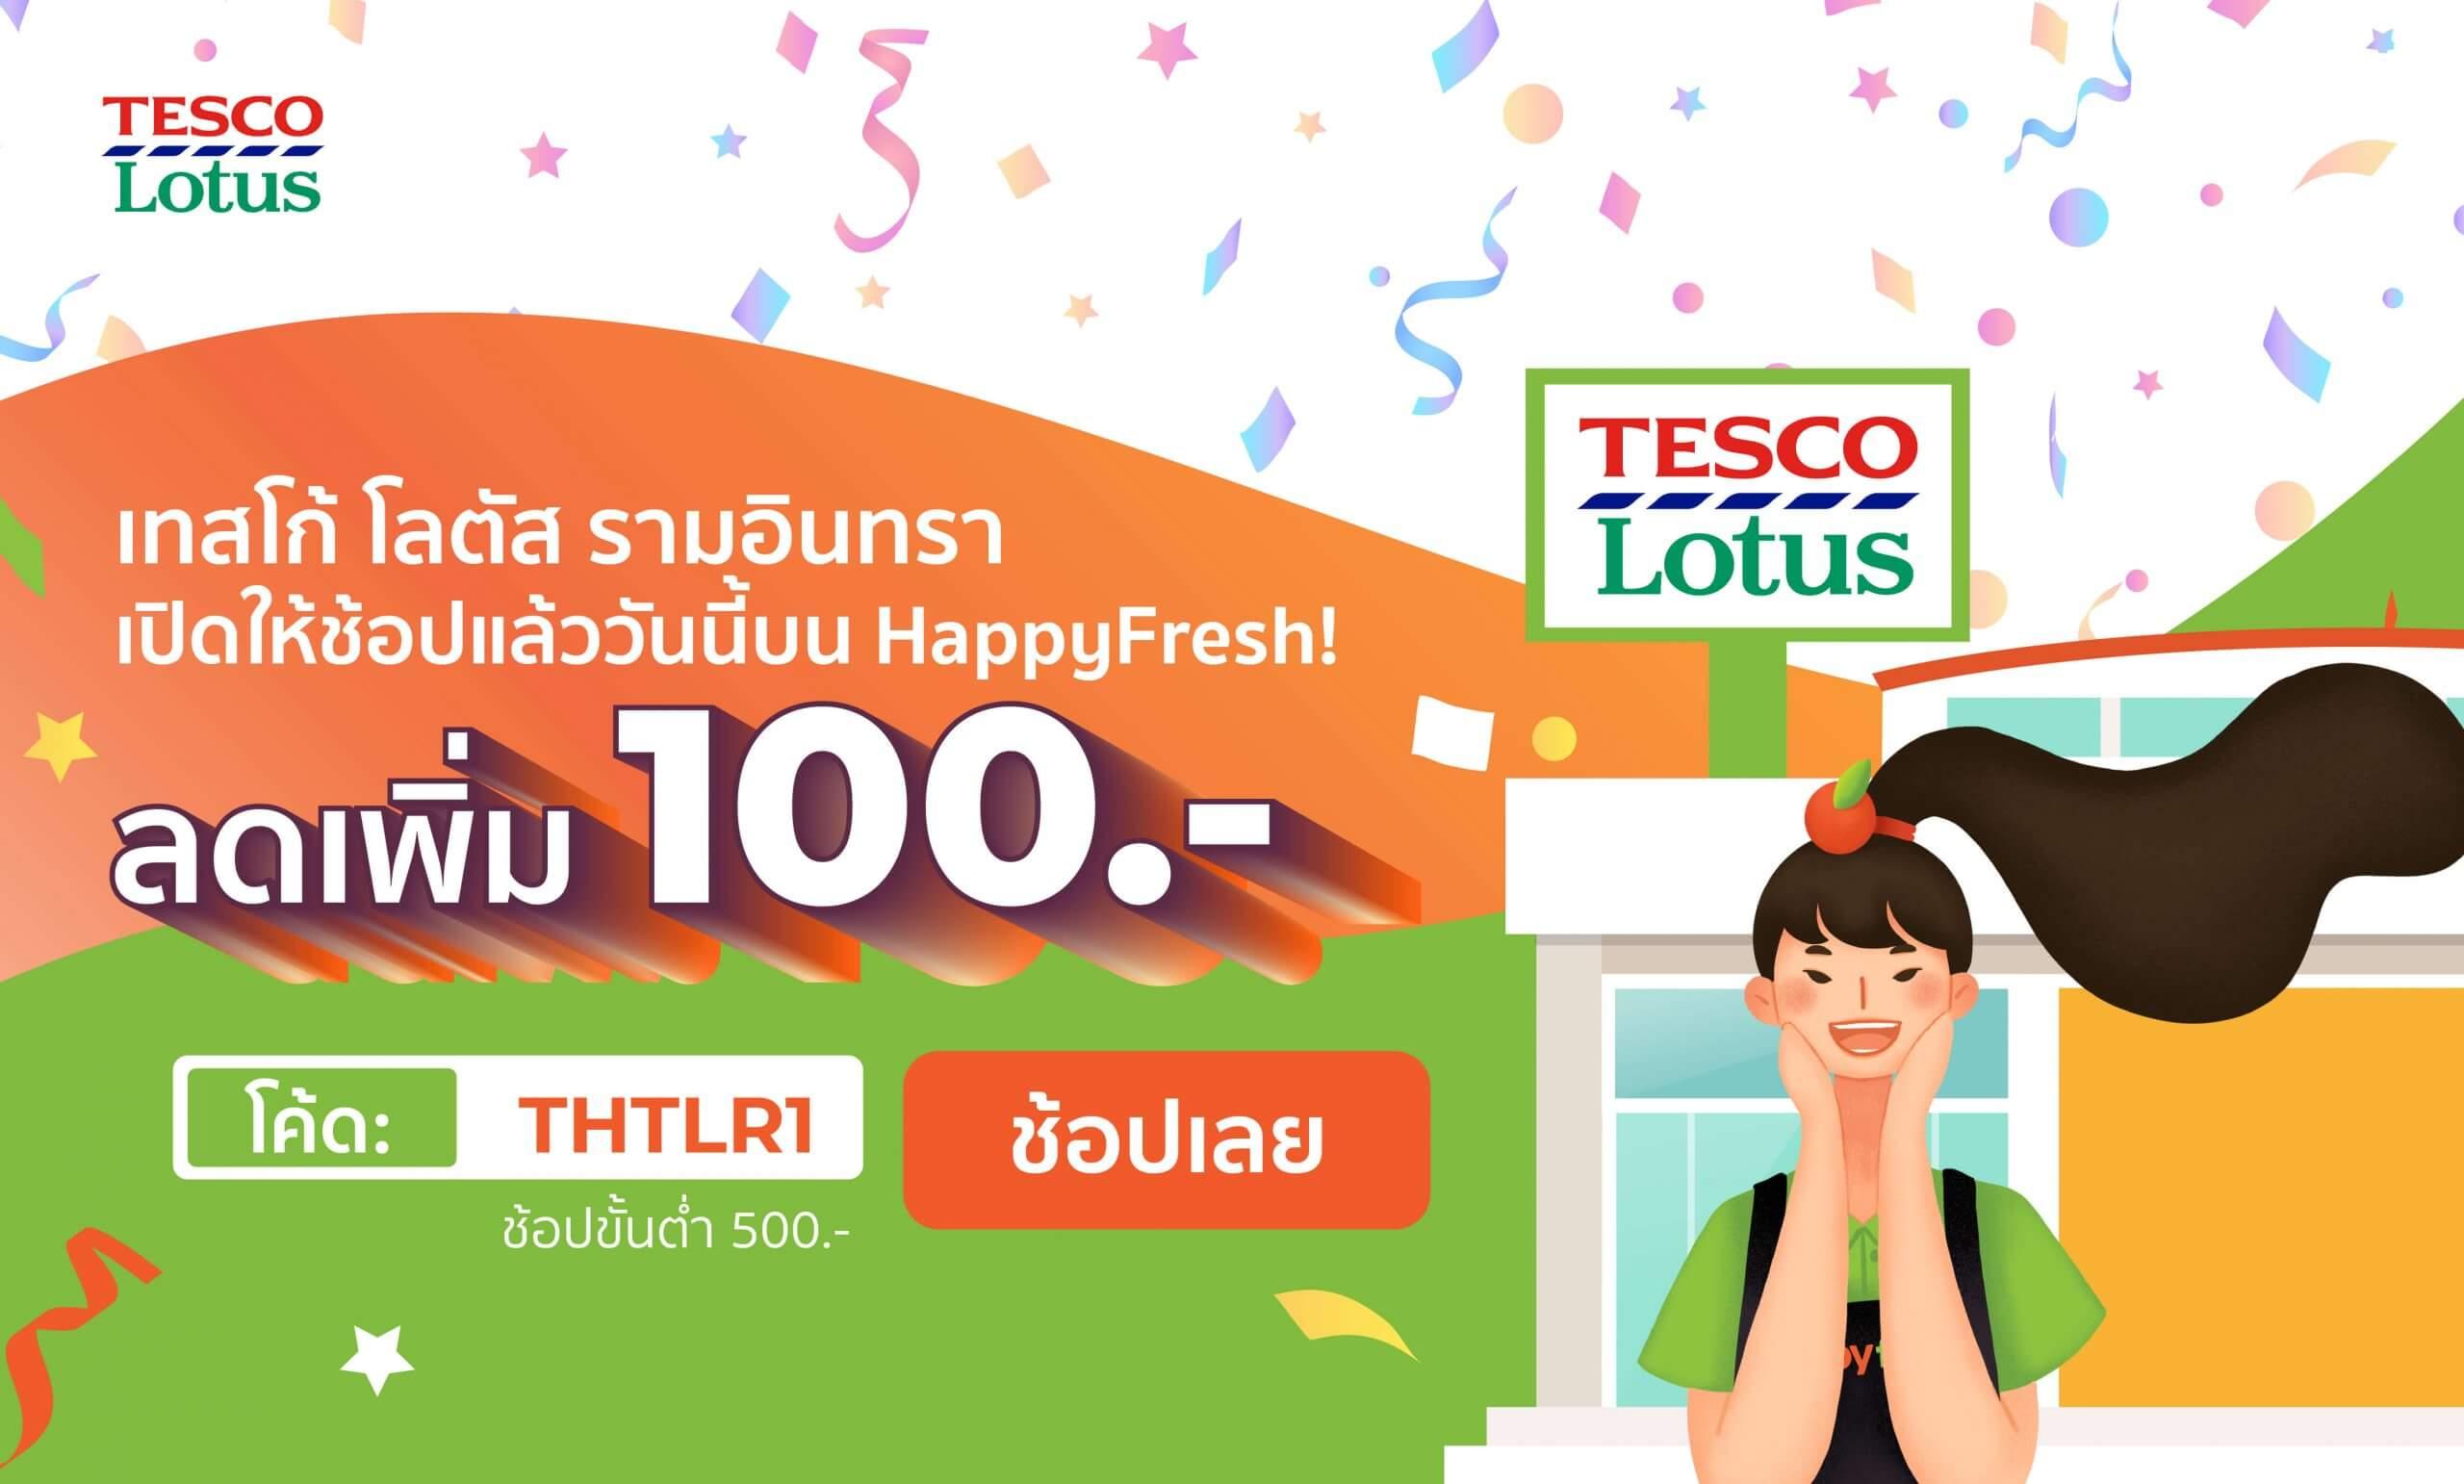 HappyFresh_Feature_Image_New_Stores_Tesco_Lotus_Ramindra